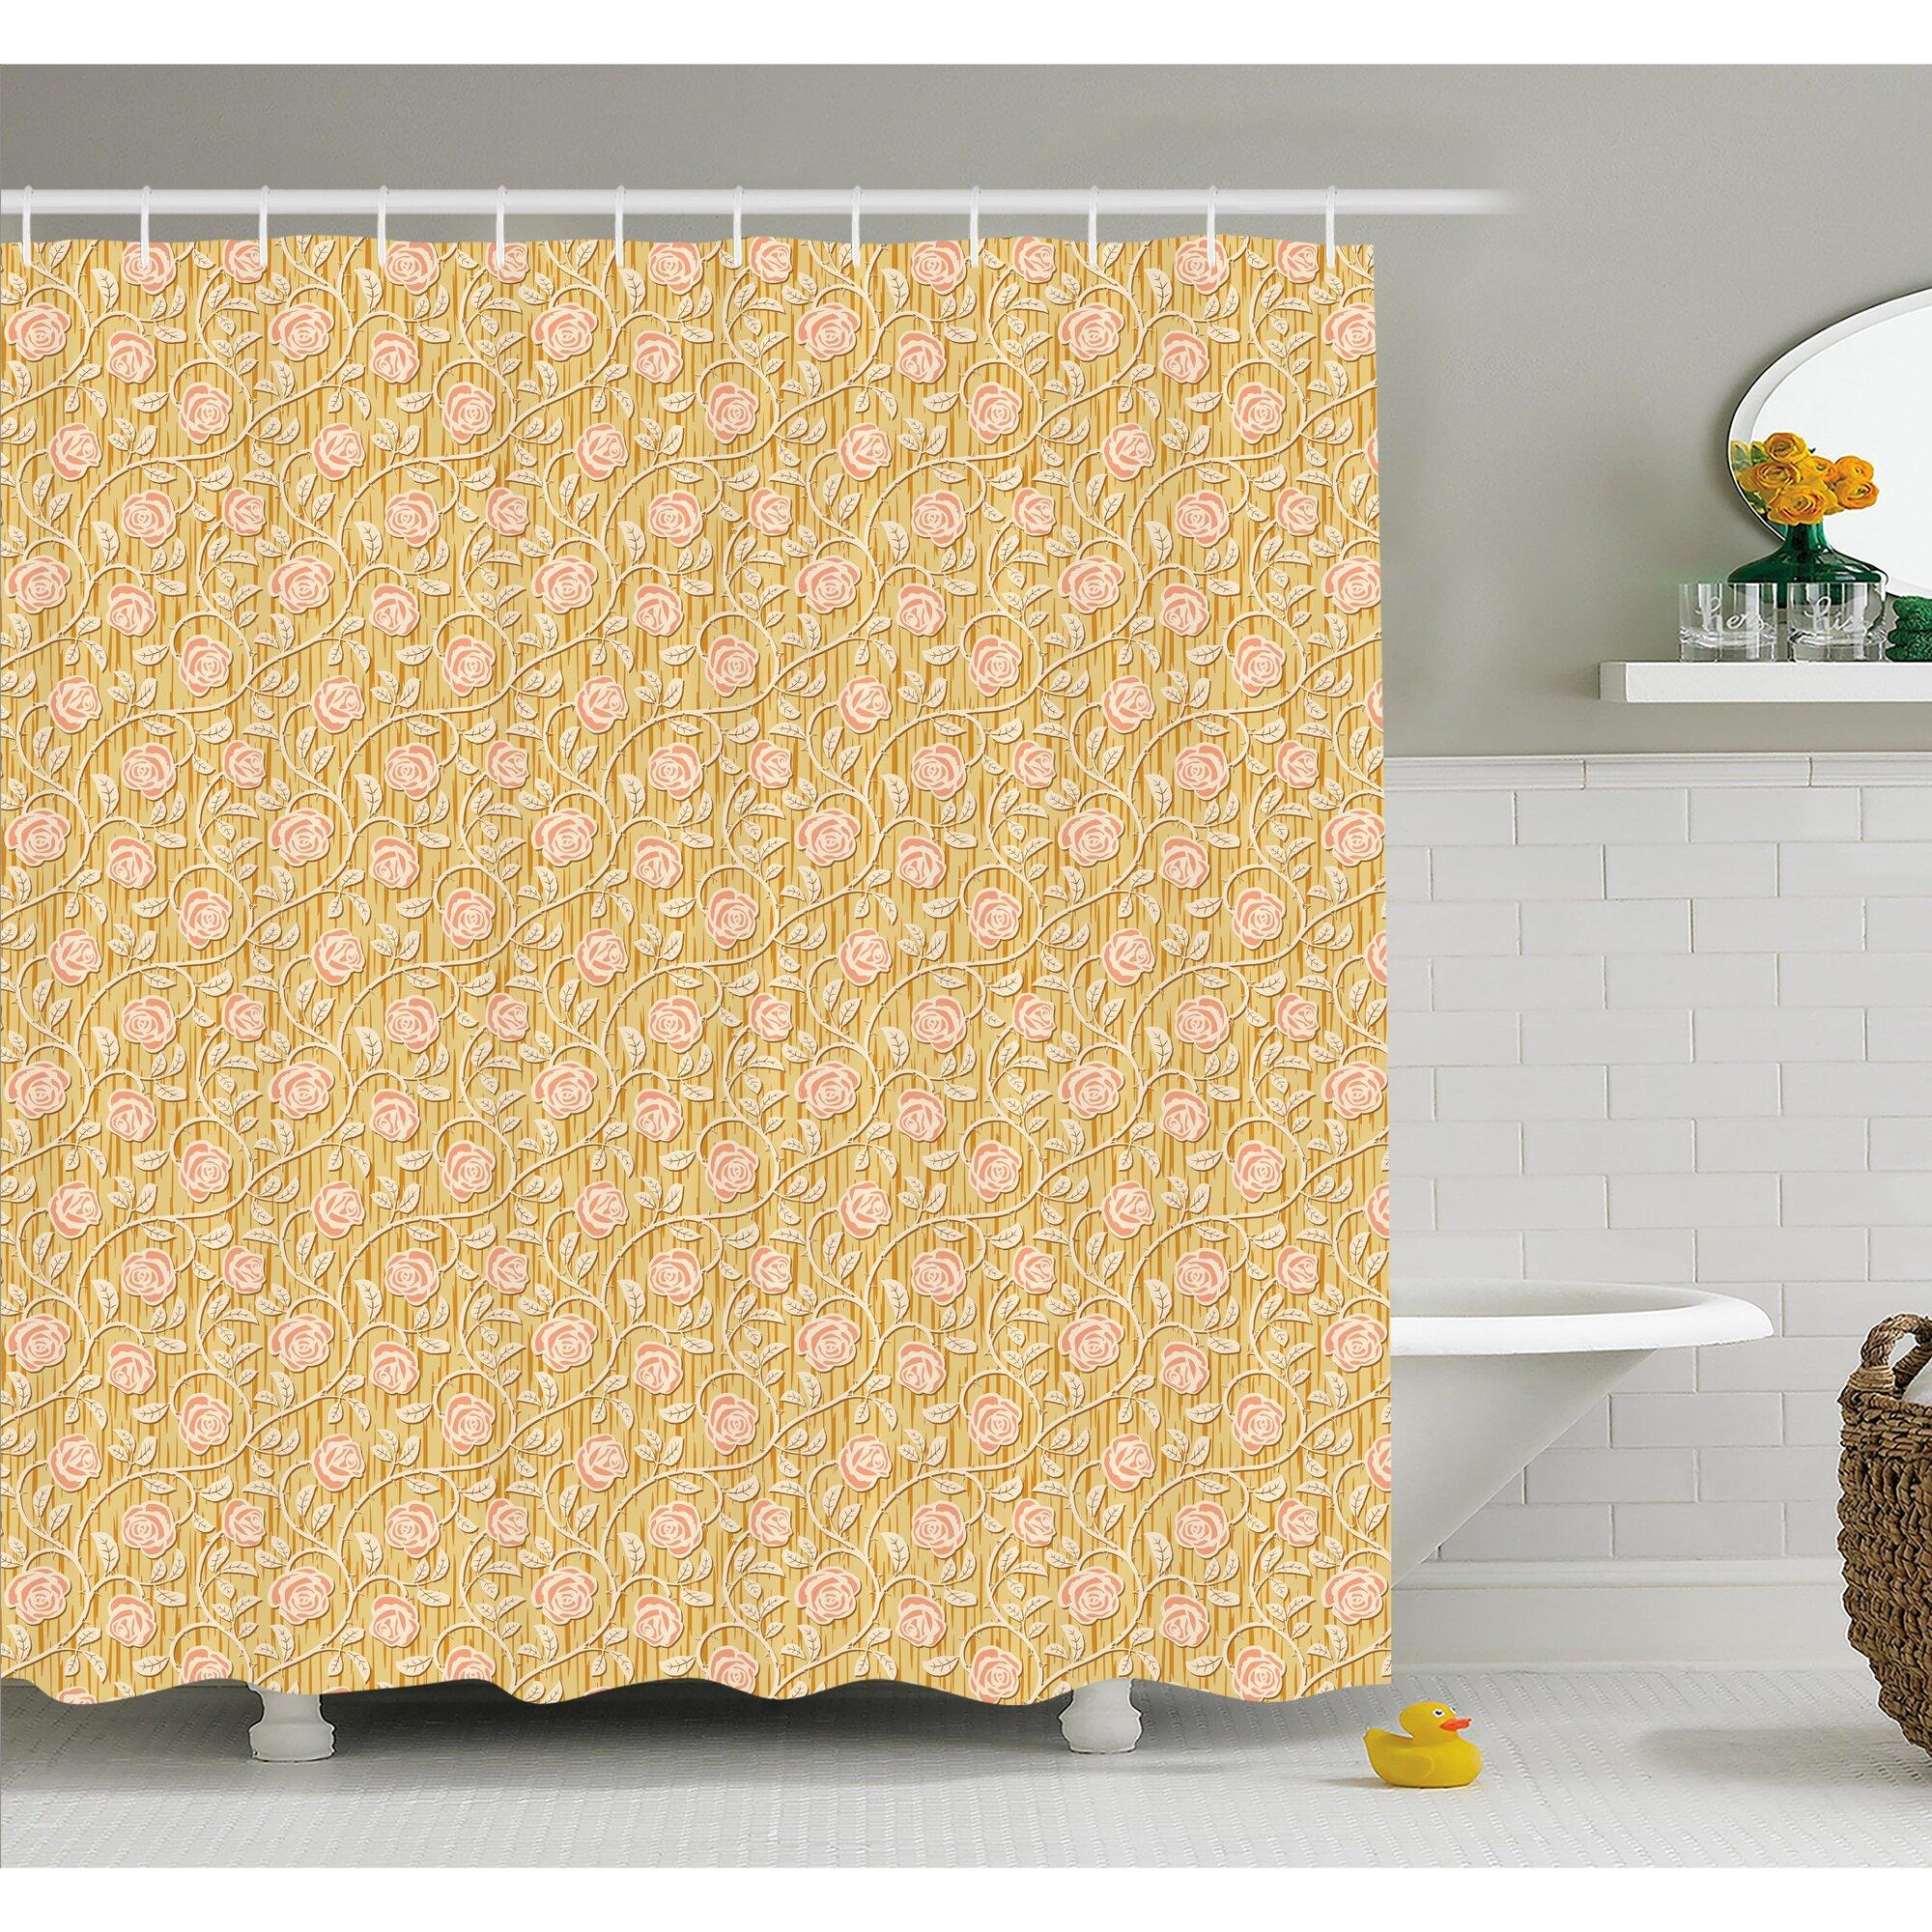 Romantic shower curtain - Romantic Rose Petals With Branches Nature Beauty Valentine Feminine Print Shower Curtain Set